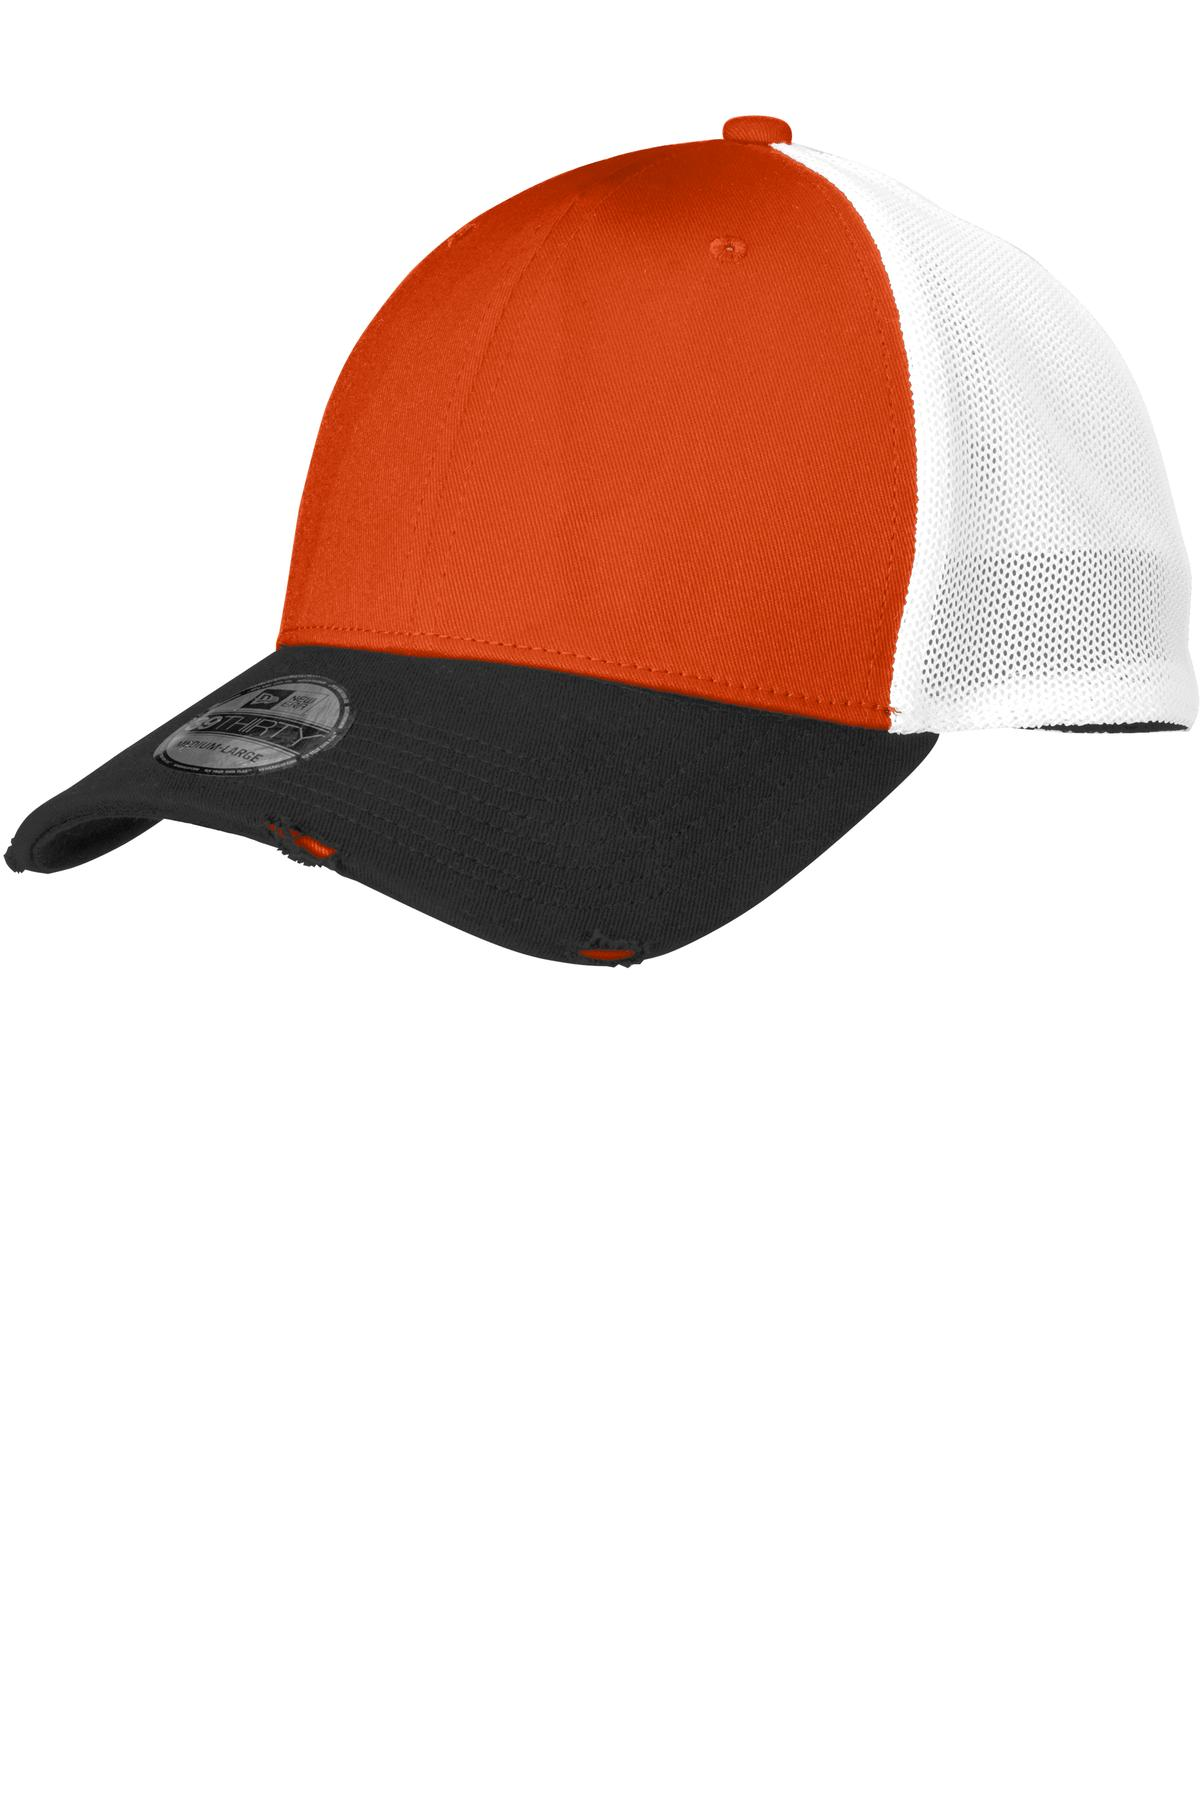 New Era® NE1080 - Vintage Mesh Cap - Headwear ae9e7ca6fe2